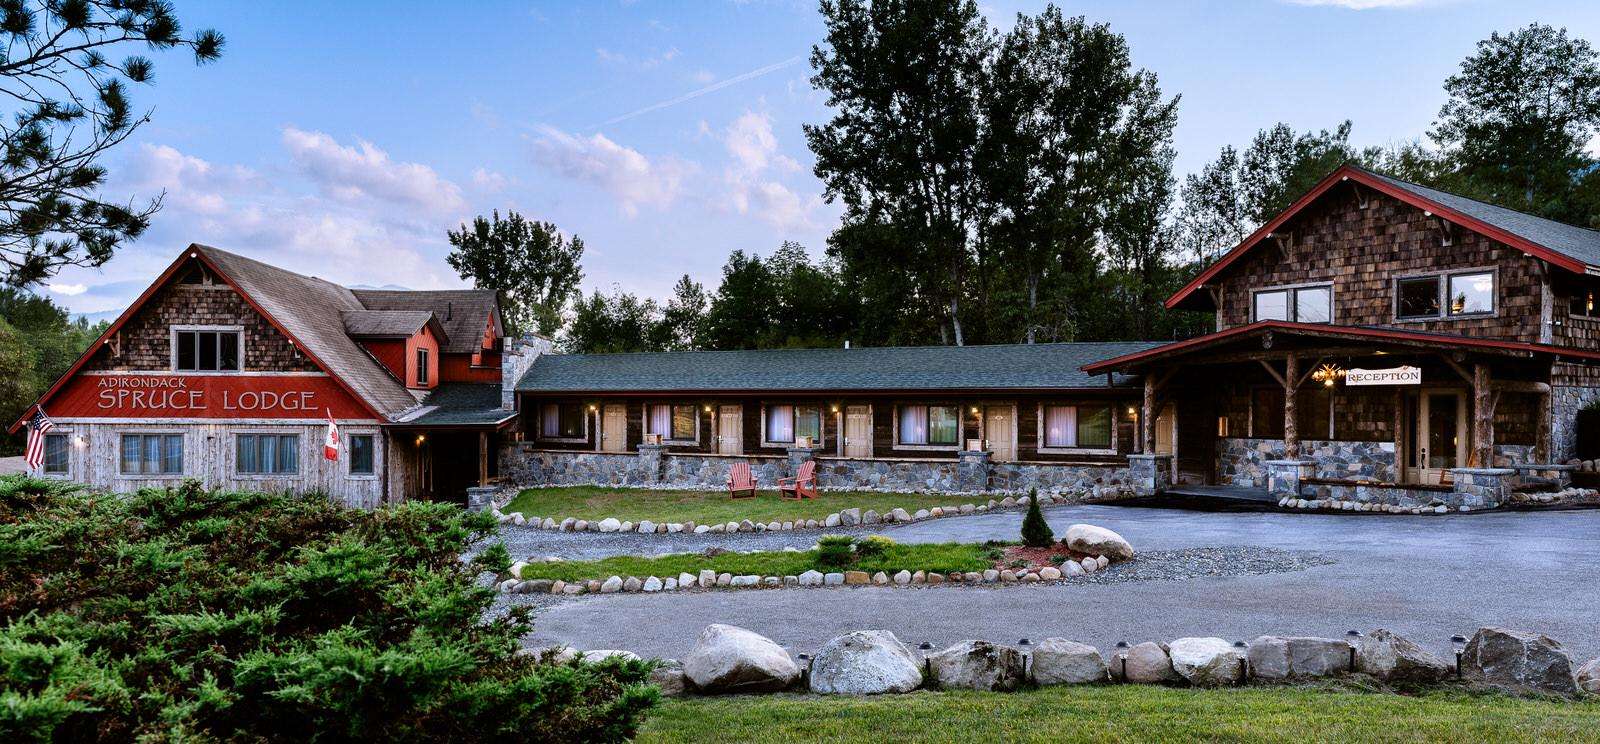 Adk-Spruce-Lodge-Header-Photo1.jpg